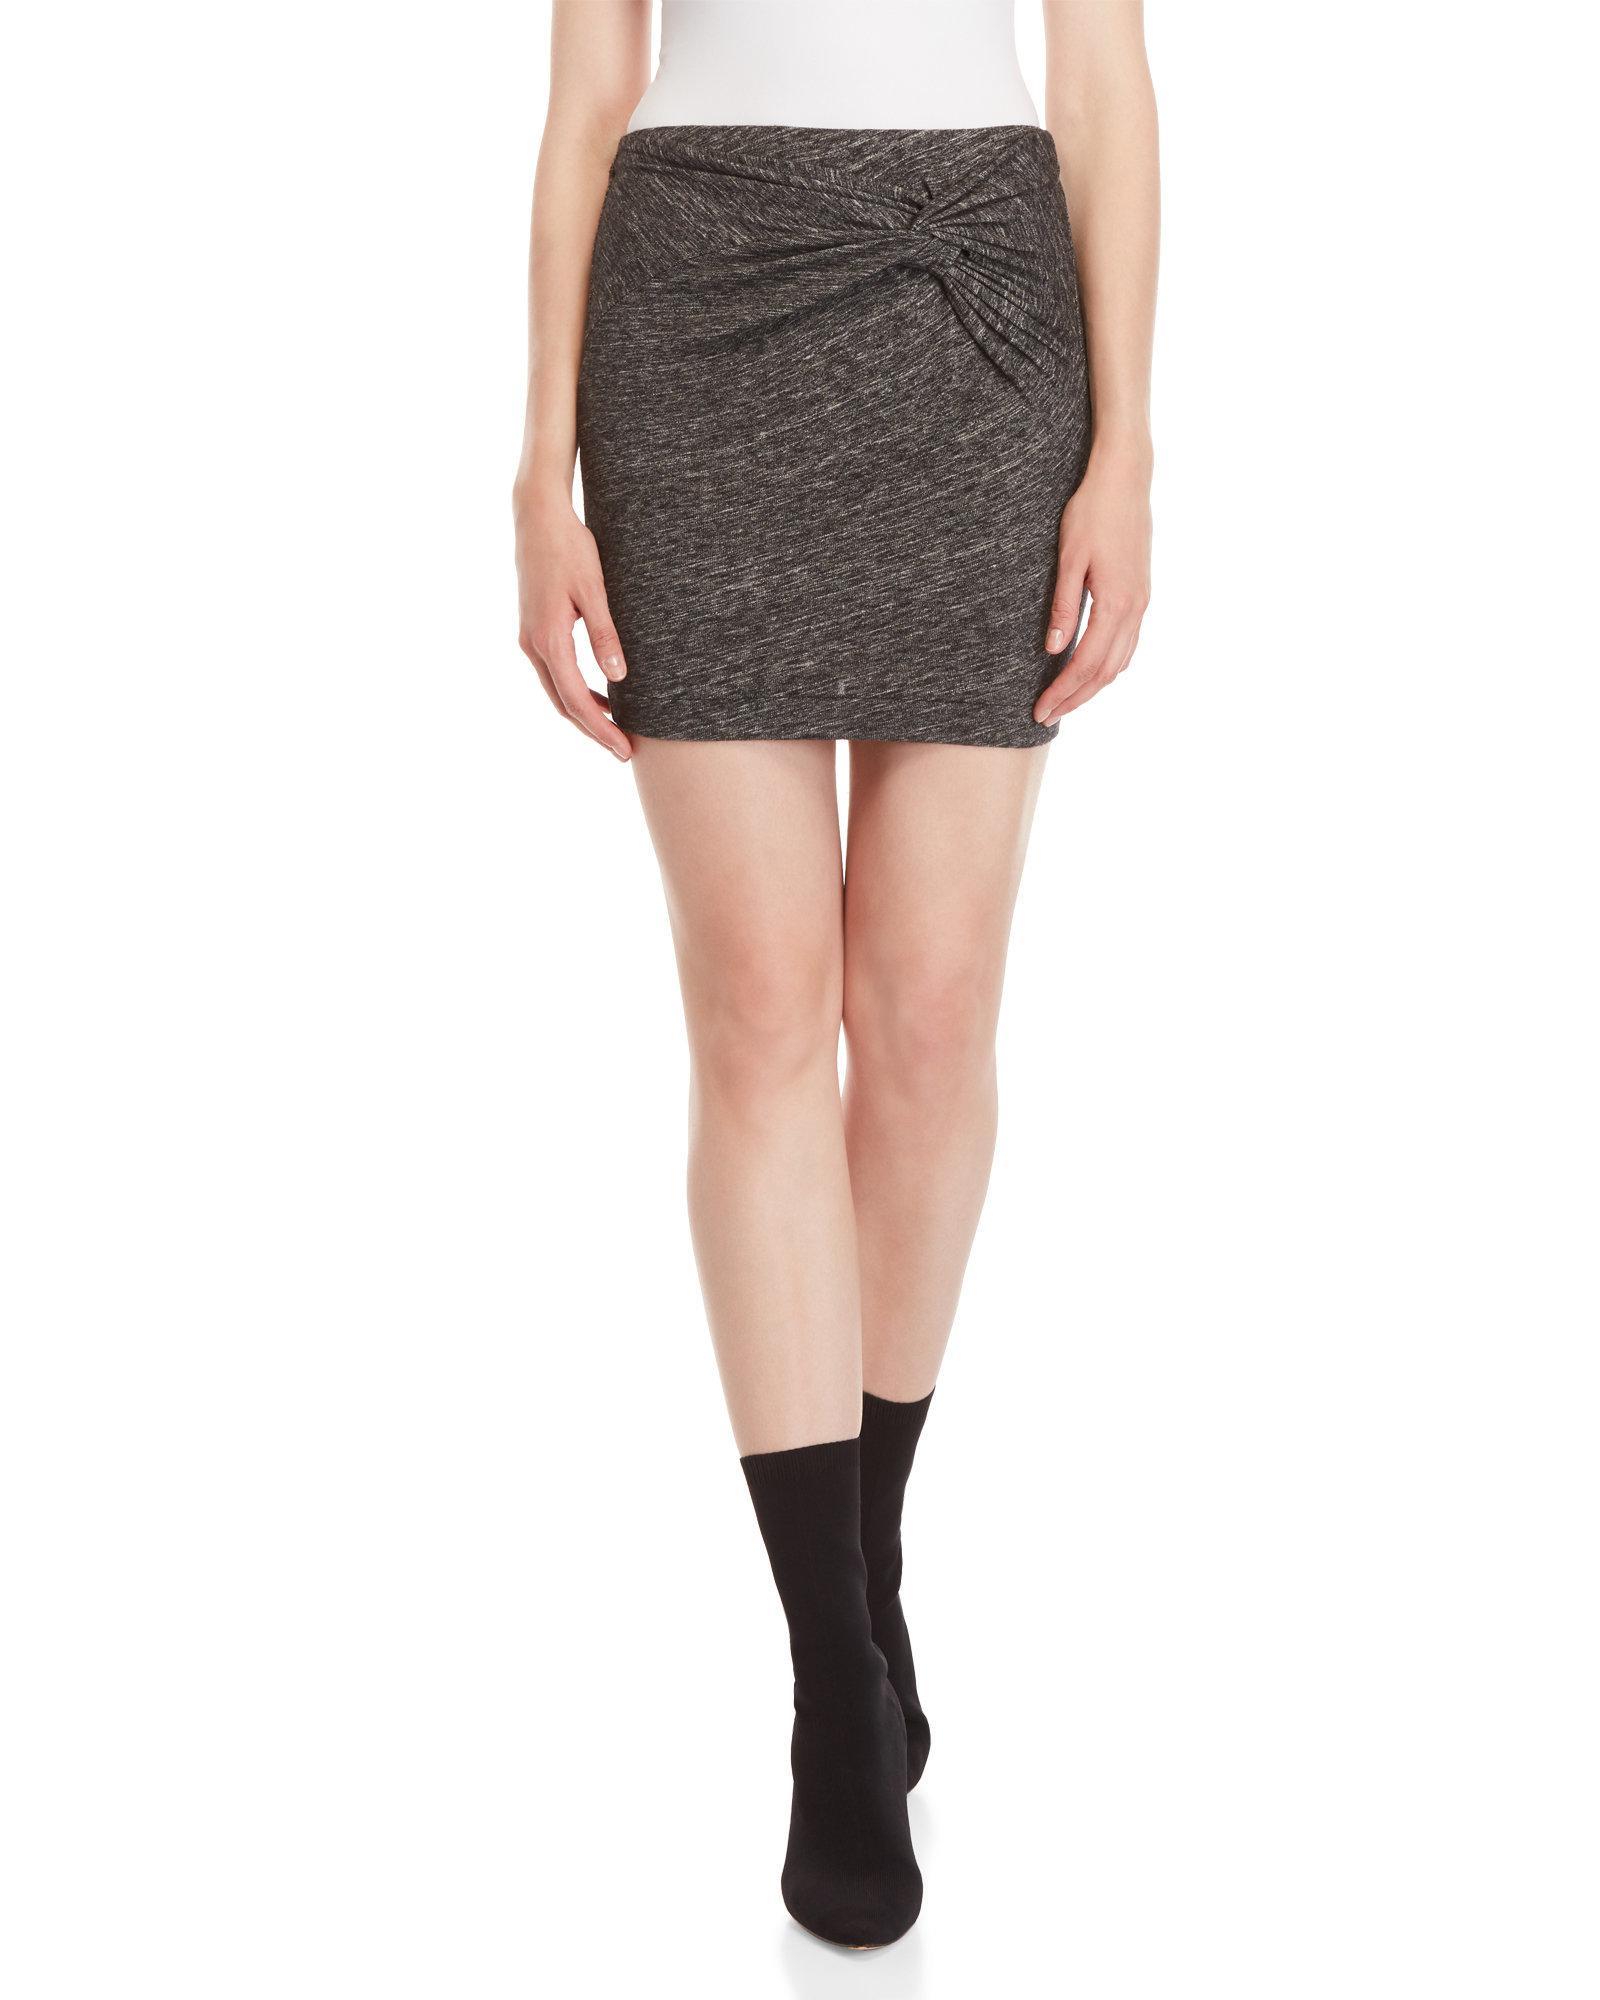 fed4da8478 7fairy Dark Grey Cotton Heart Print Mini Pencil Jump Skirt. Iro Women S Gray  Grey Marl Twist Mini Skirt. Lyst Iro Grey Marl Twist Mini Skirt In Gray